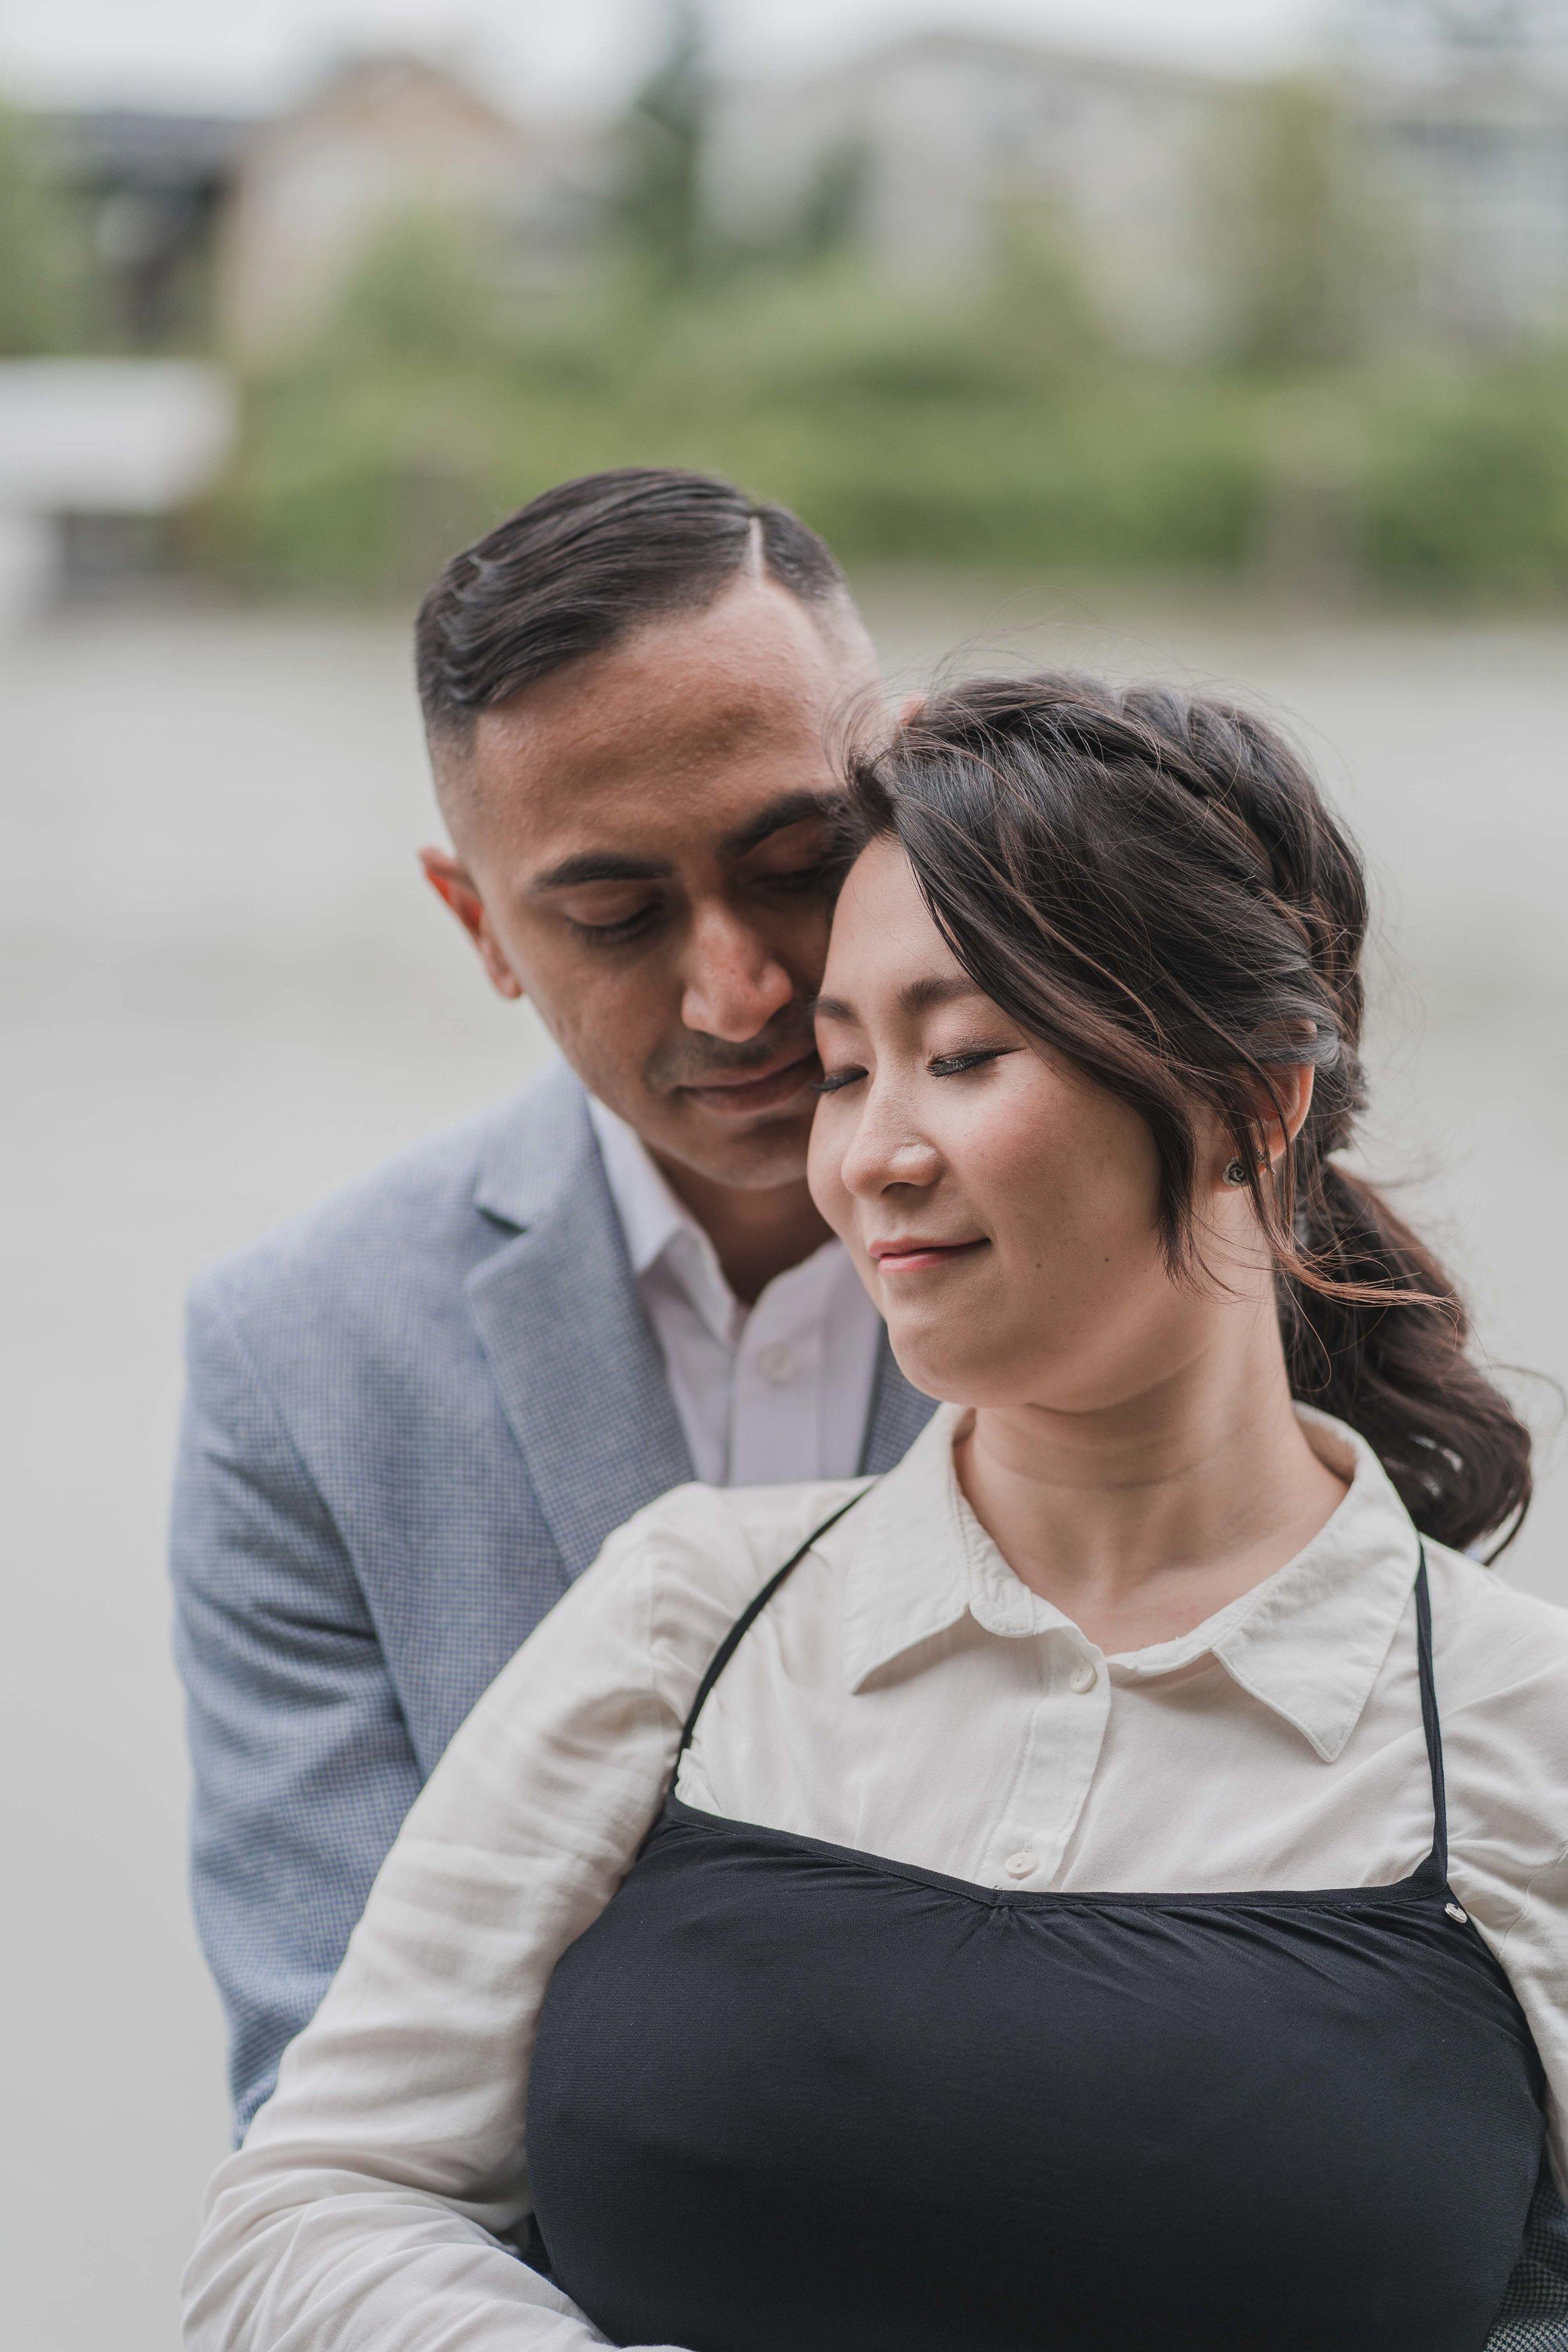 20190622 - Monika & Johnson Engagement - 0109.jpg